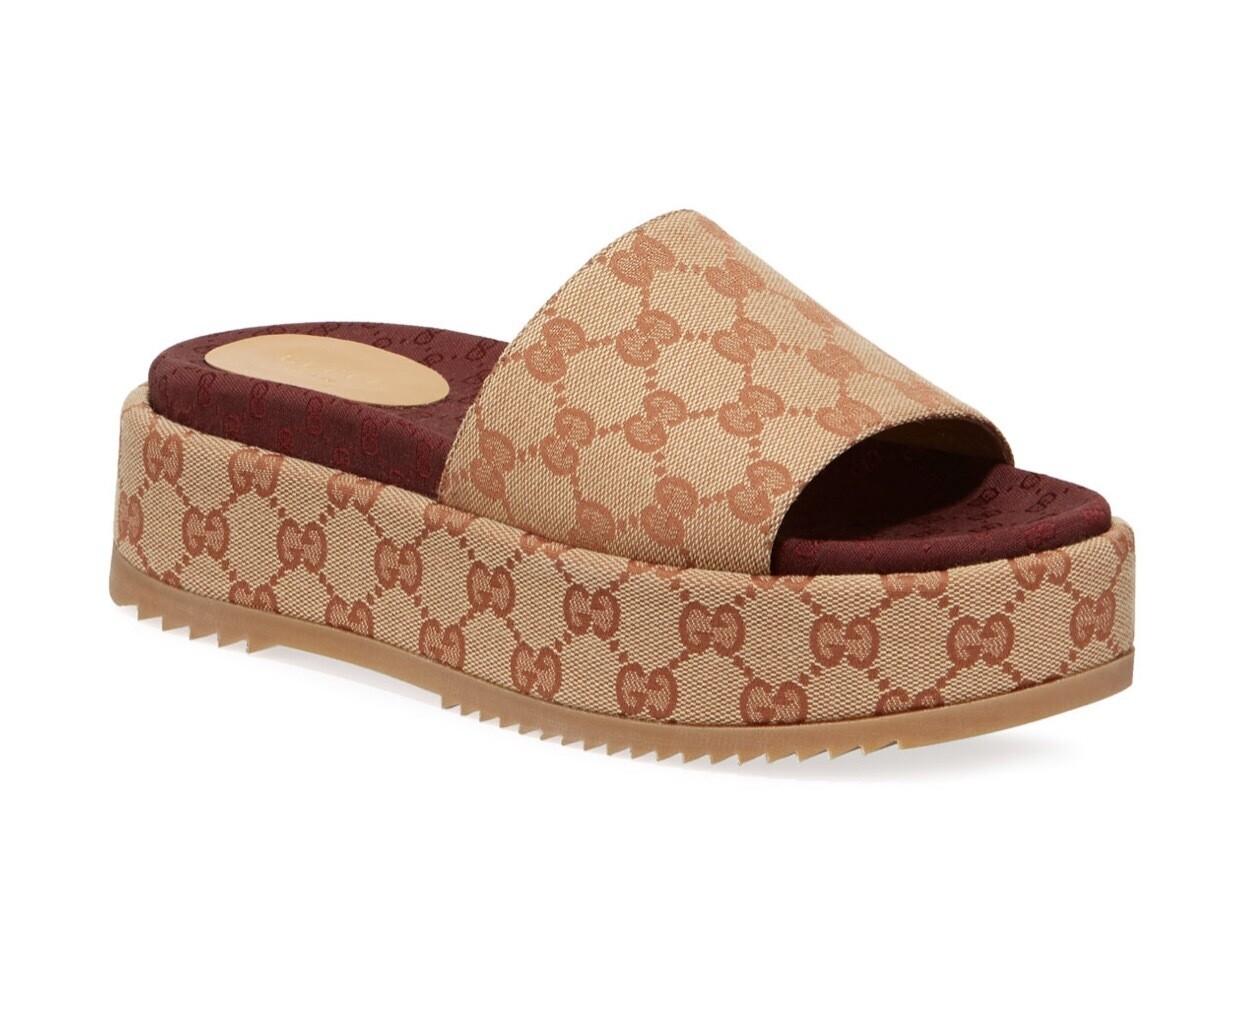 GG PLATFORM Sandal